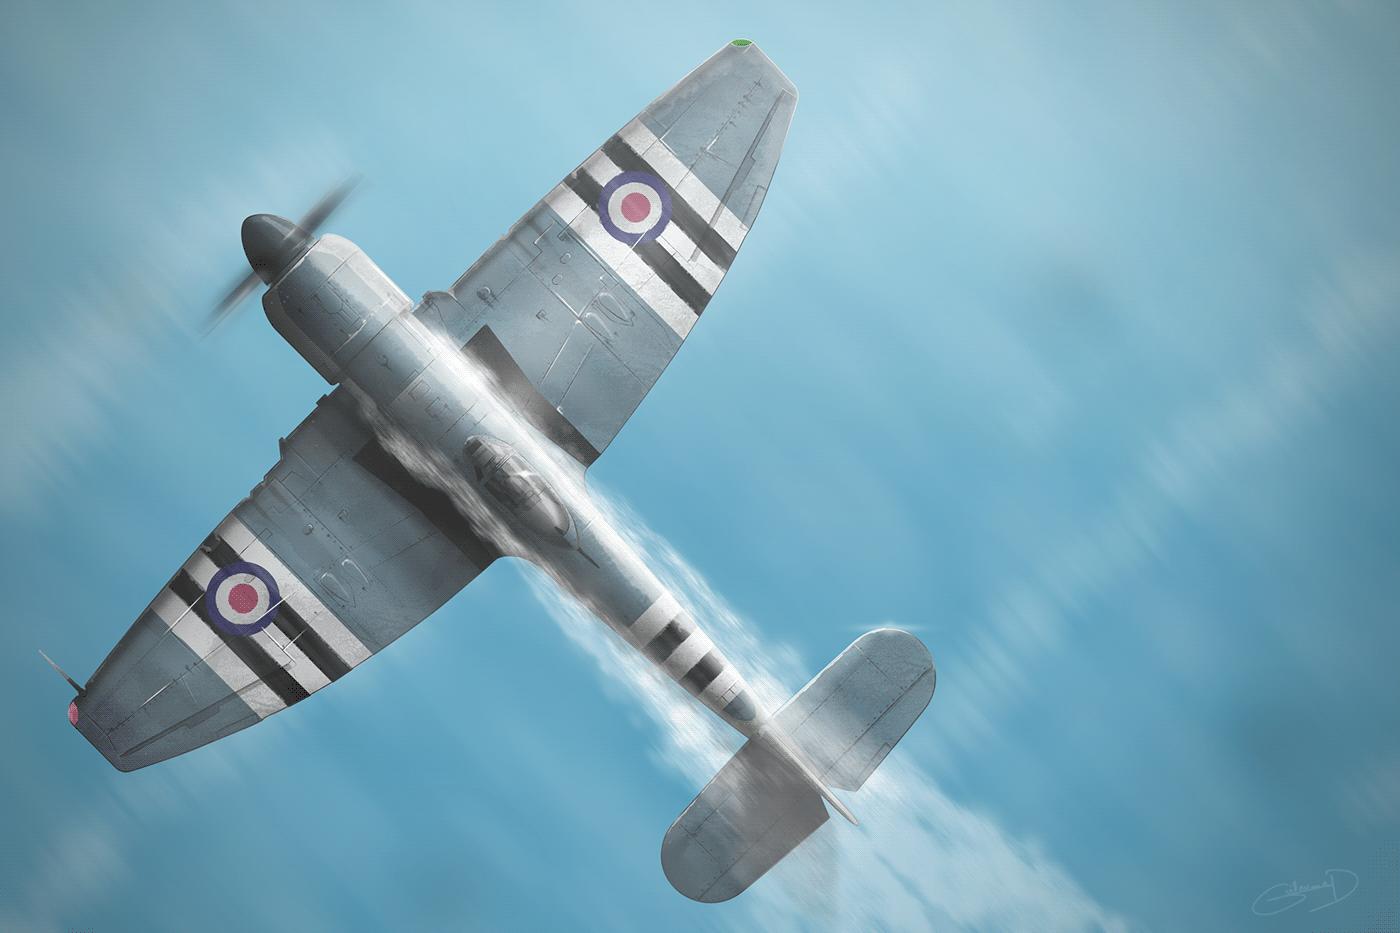 Hawker Sea Fury au dessus de l'eau